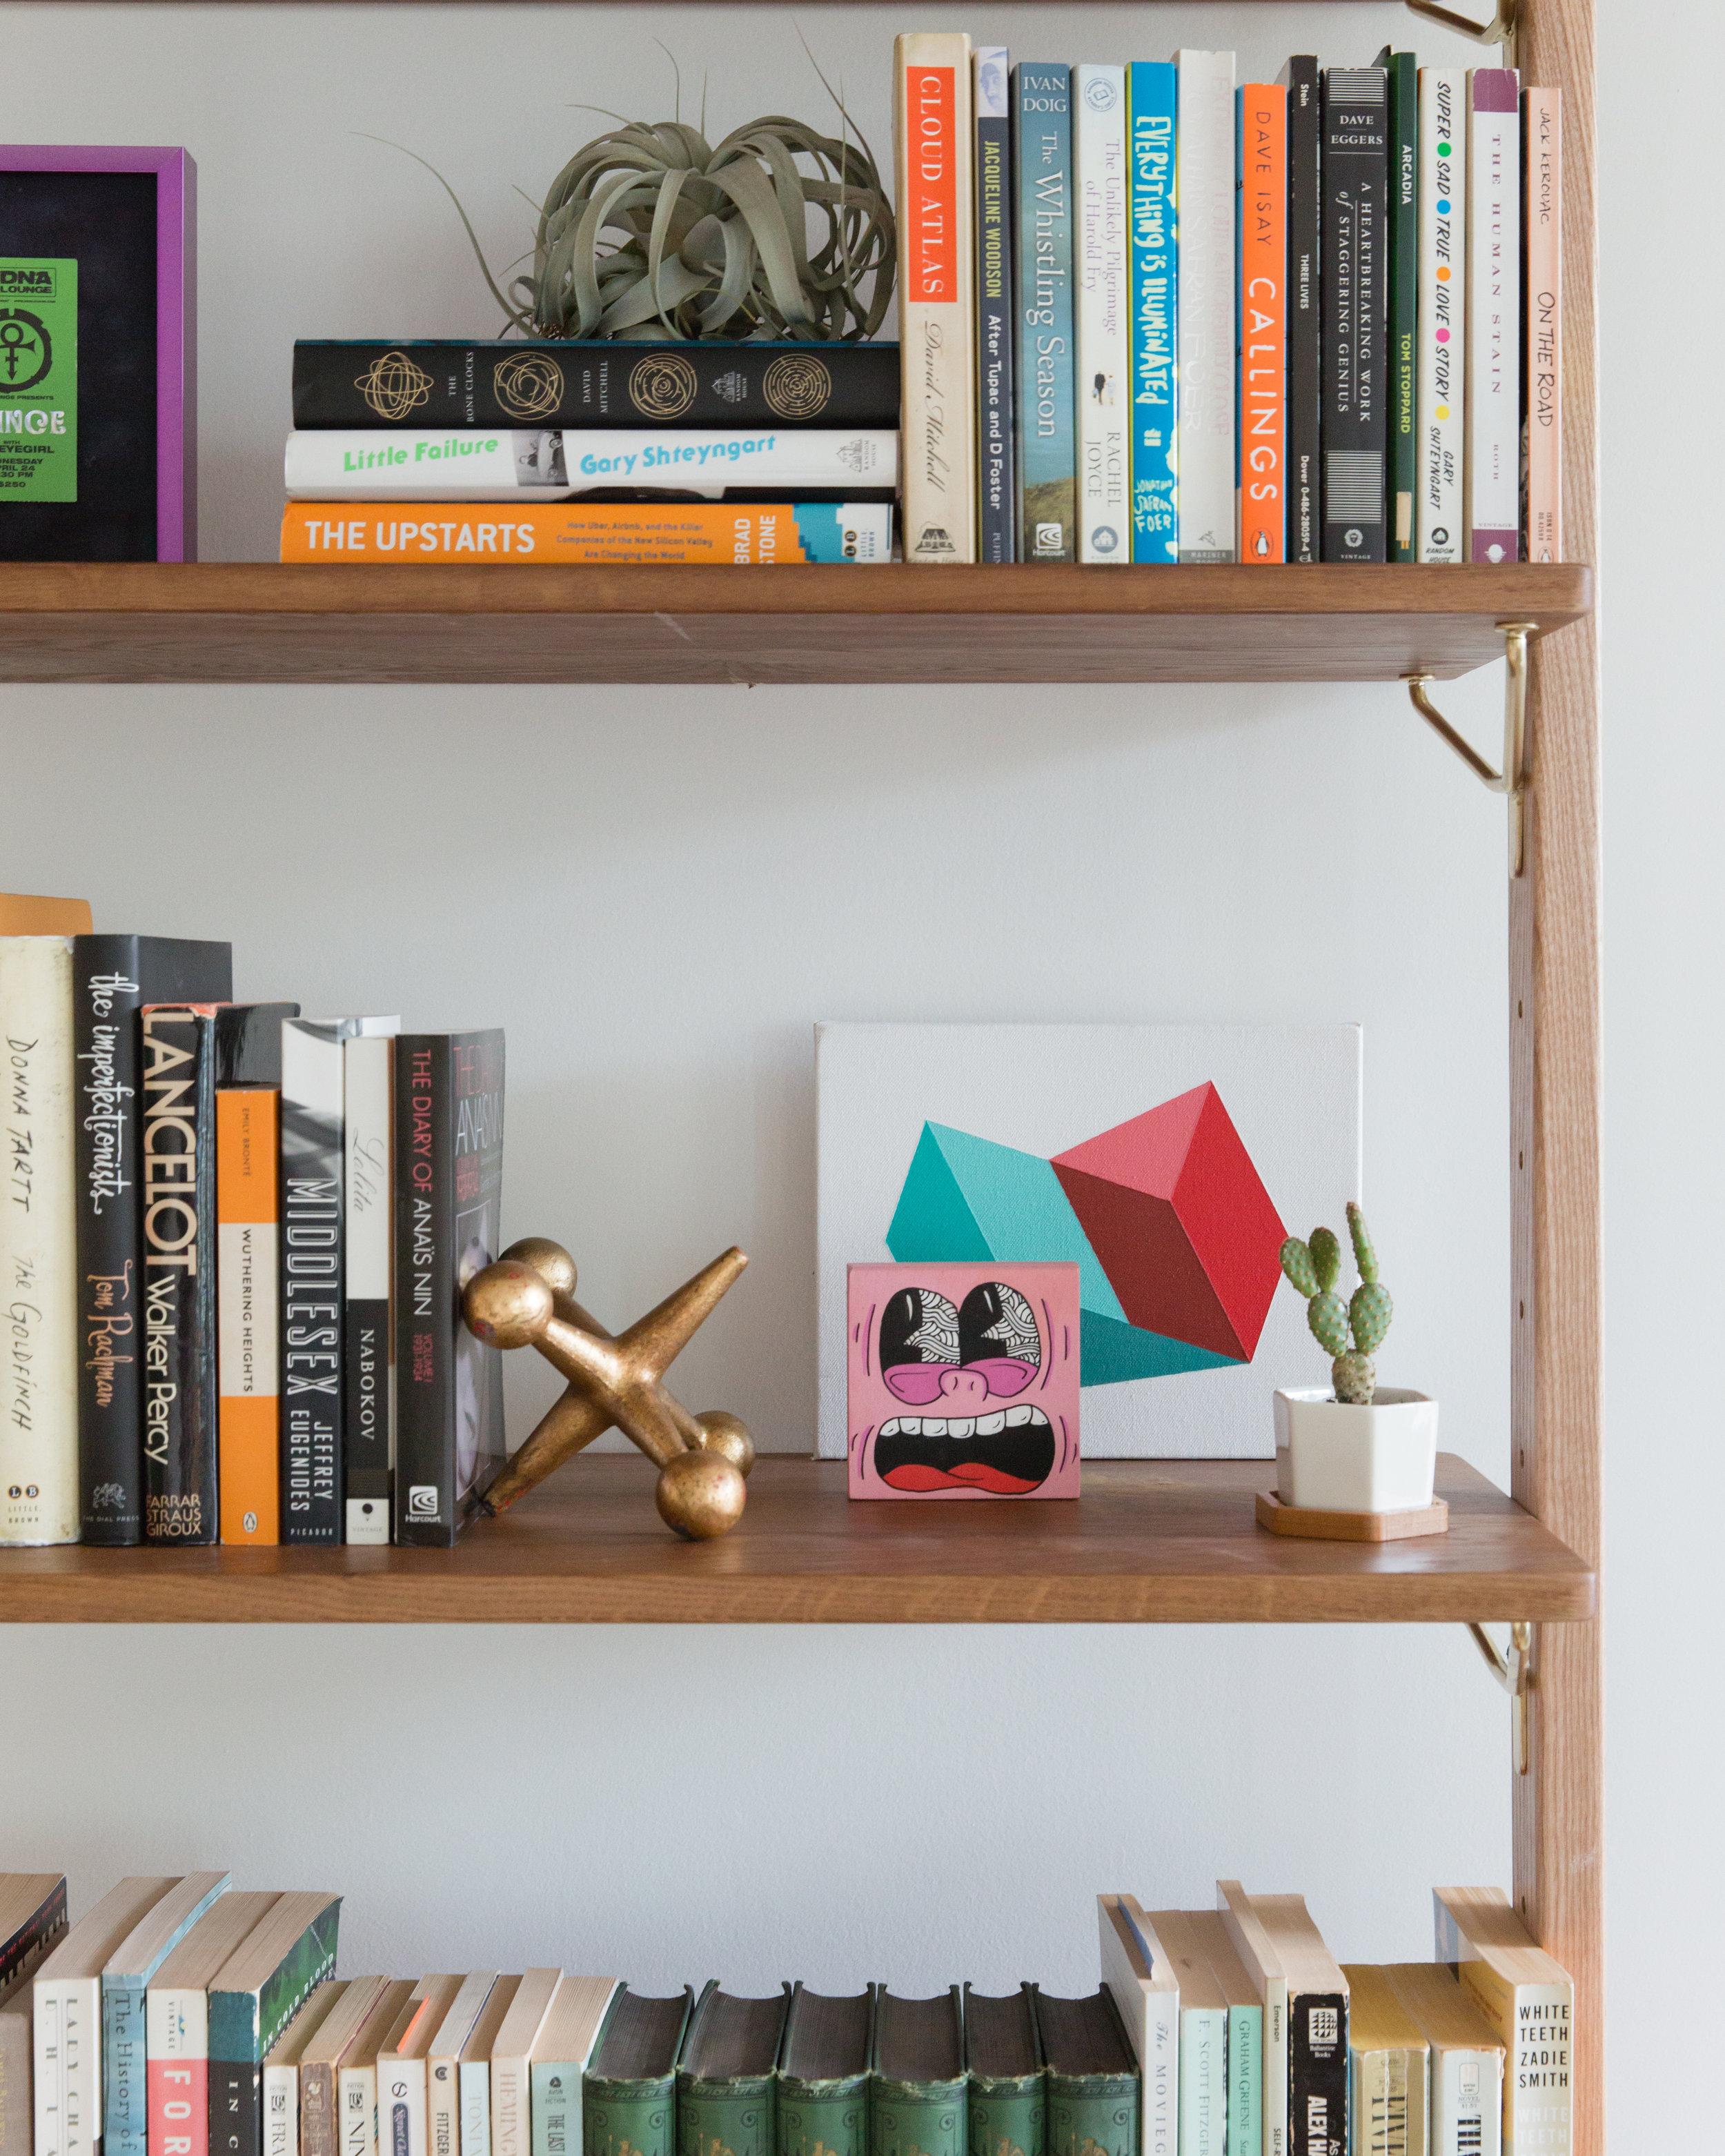 18 RBD Hayes Valley Hip Haven - Living Room Bookshelf Vignette.jpg